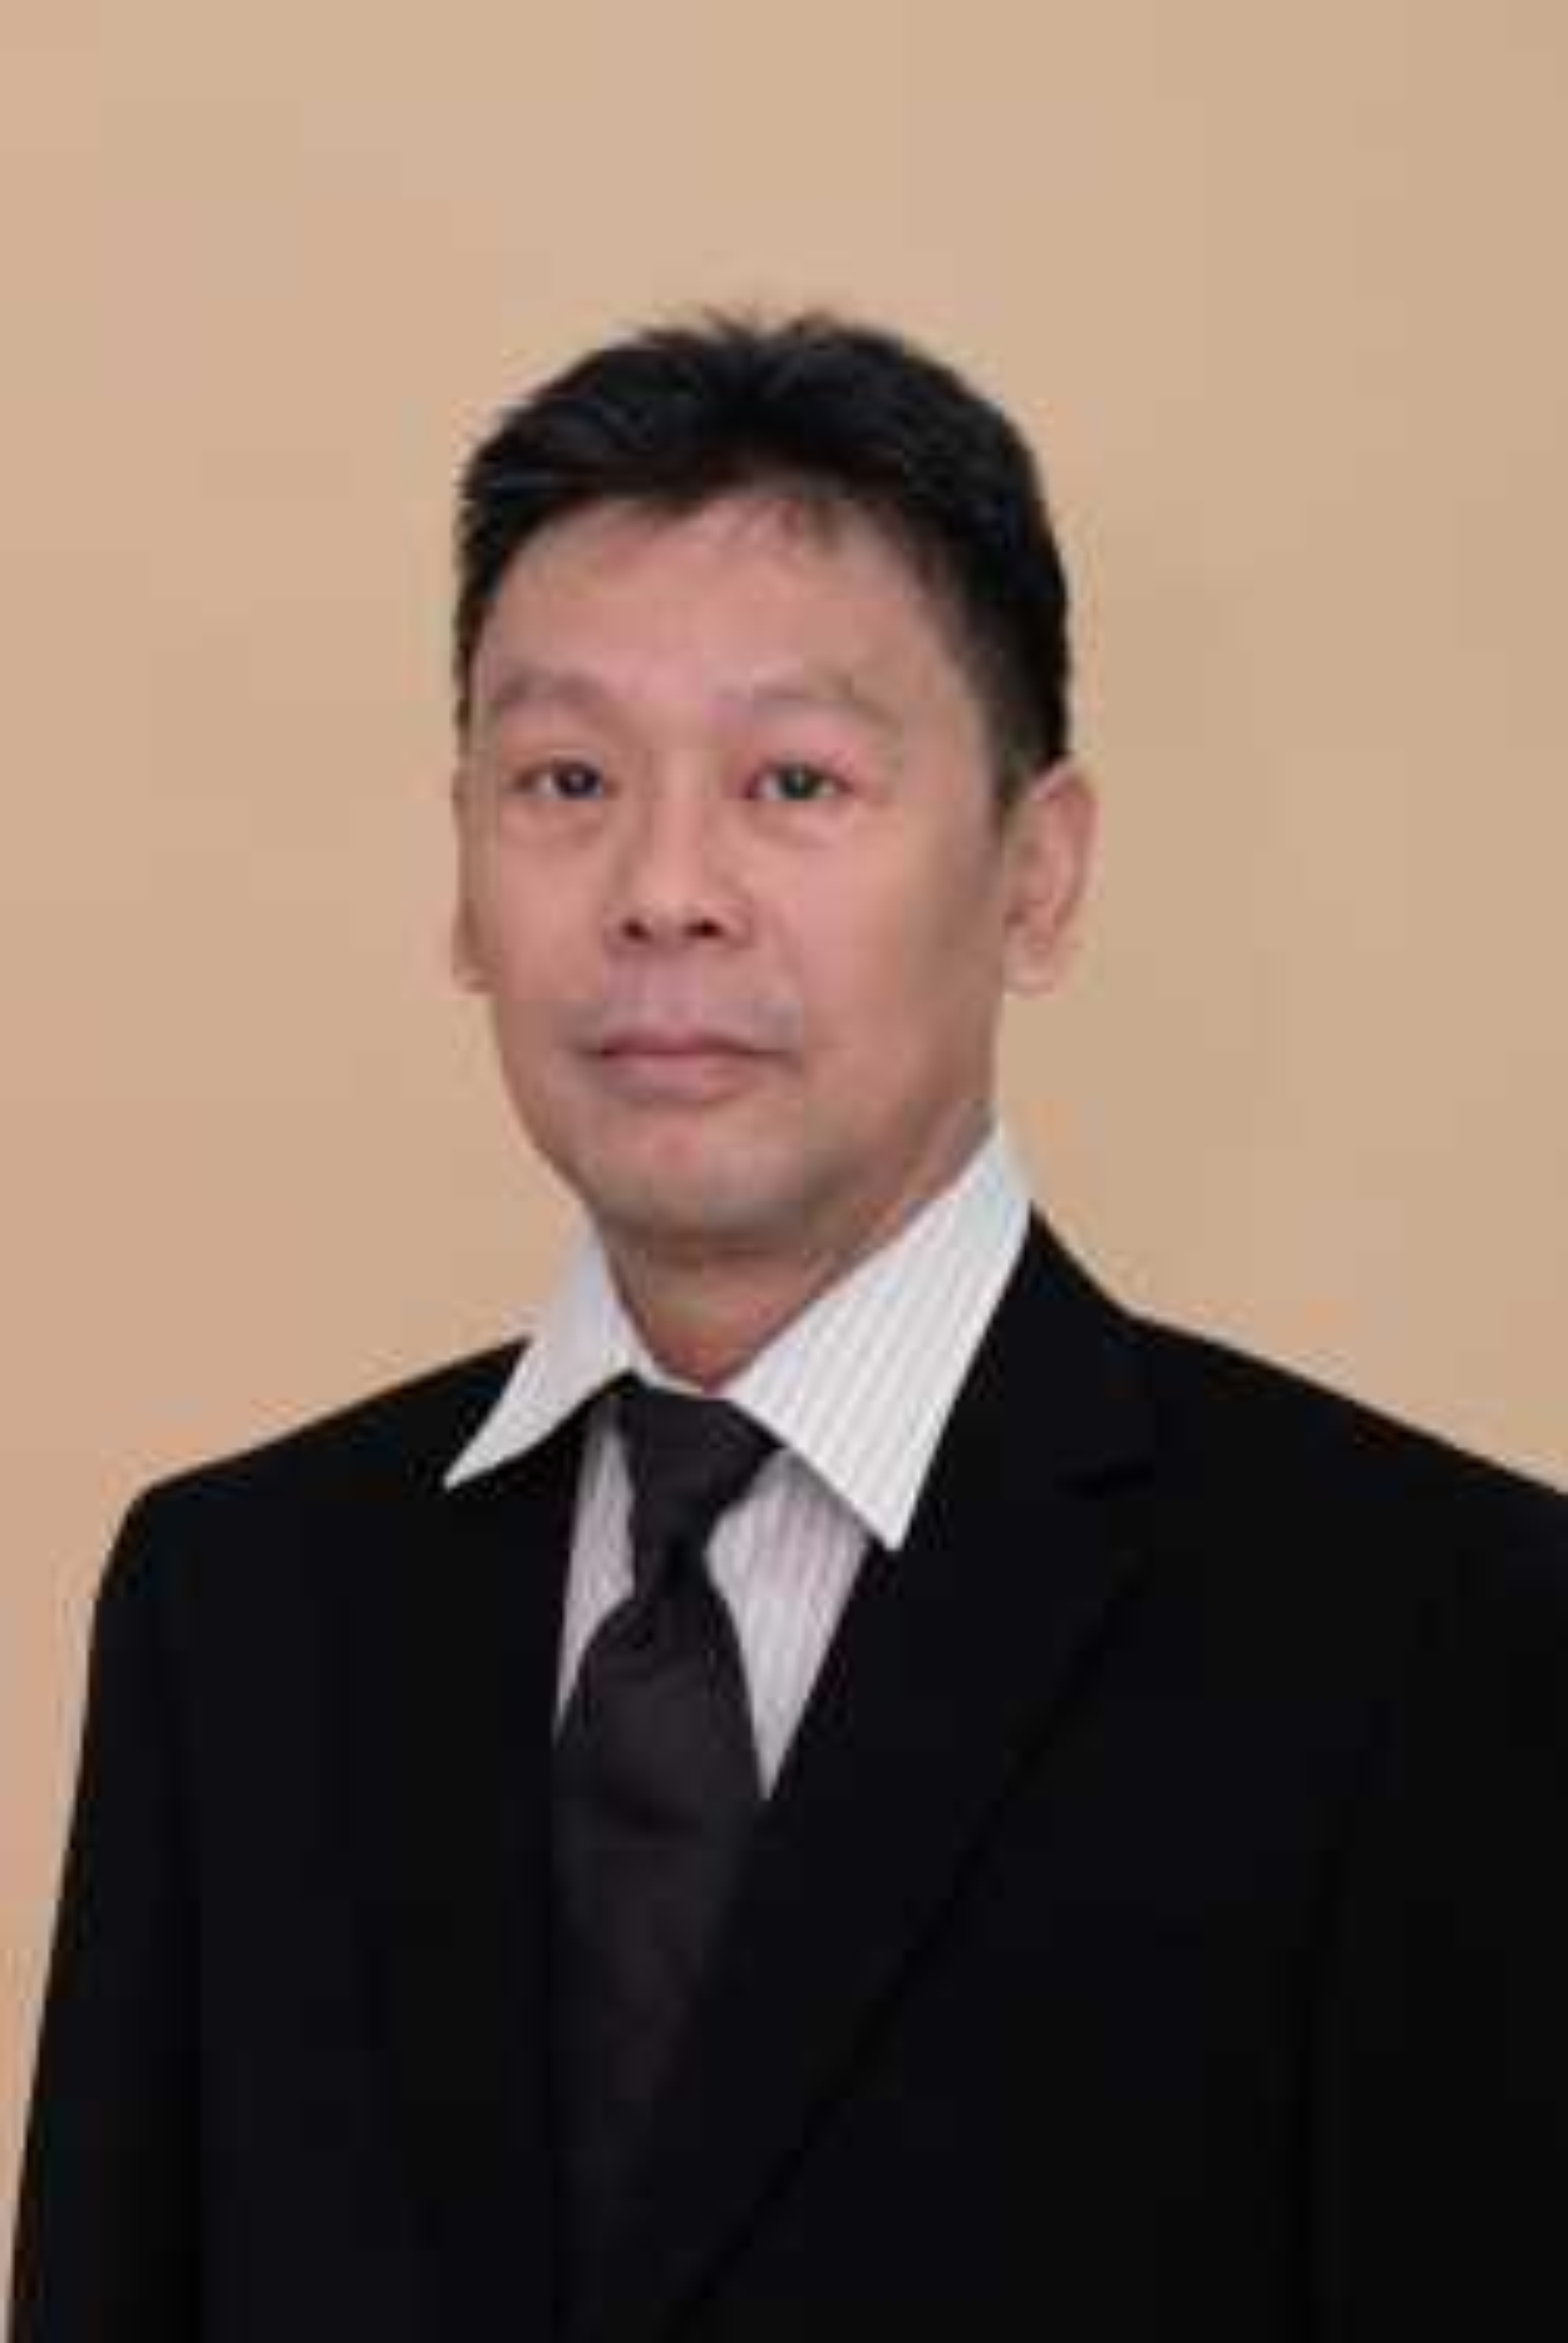 Ir. Agus Gunawan, MSEE. profile image